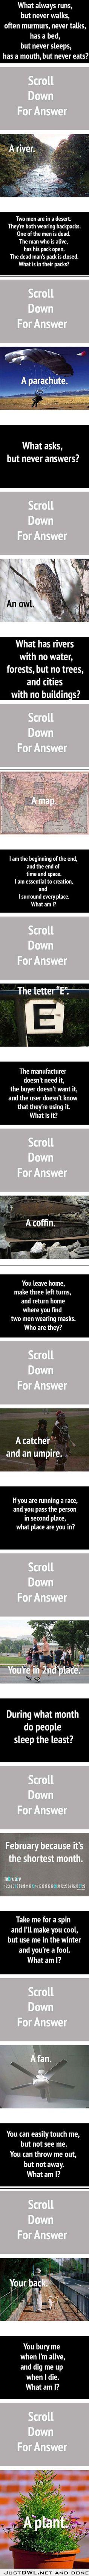 #riddles - Just #DWL